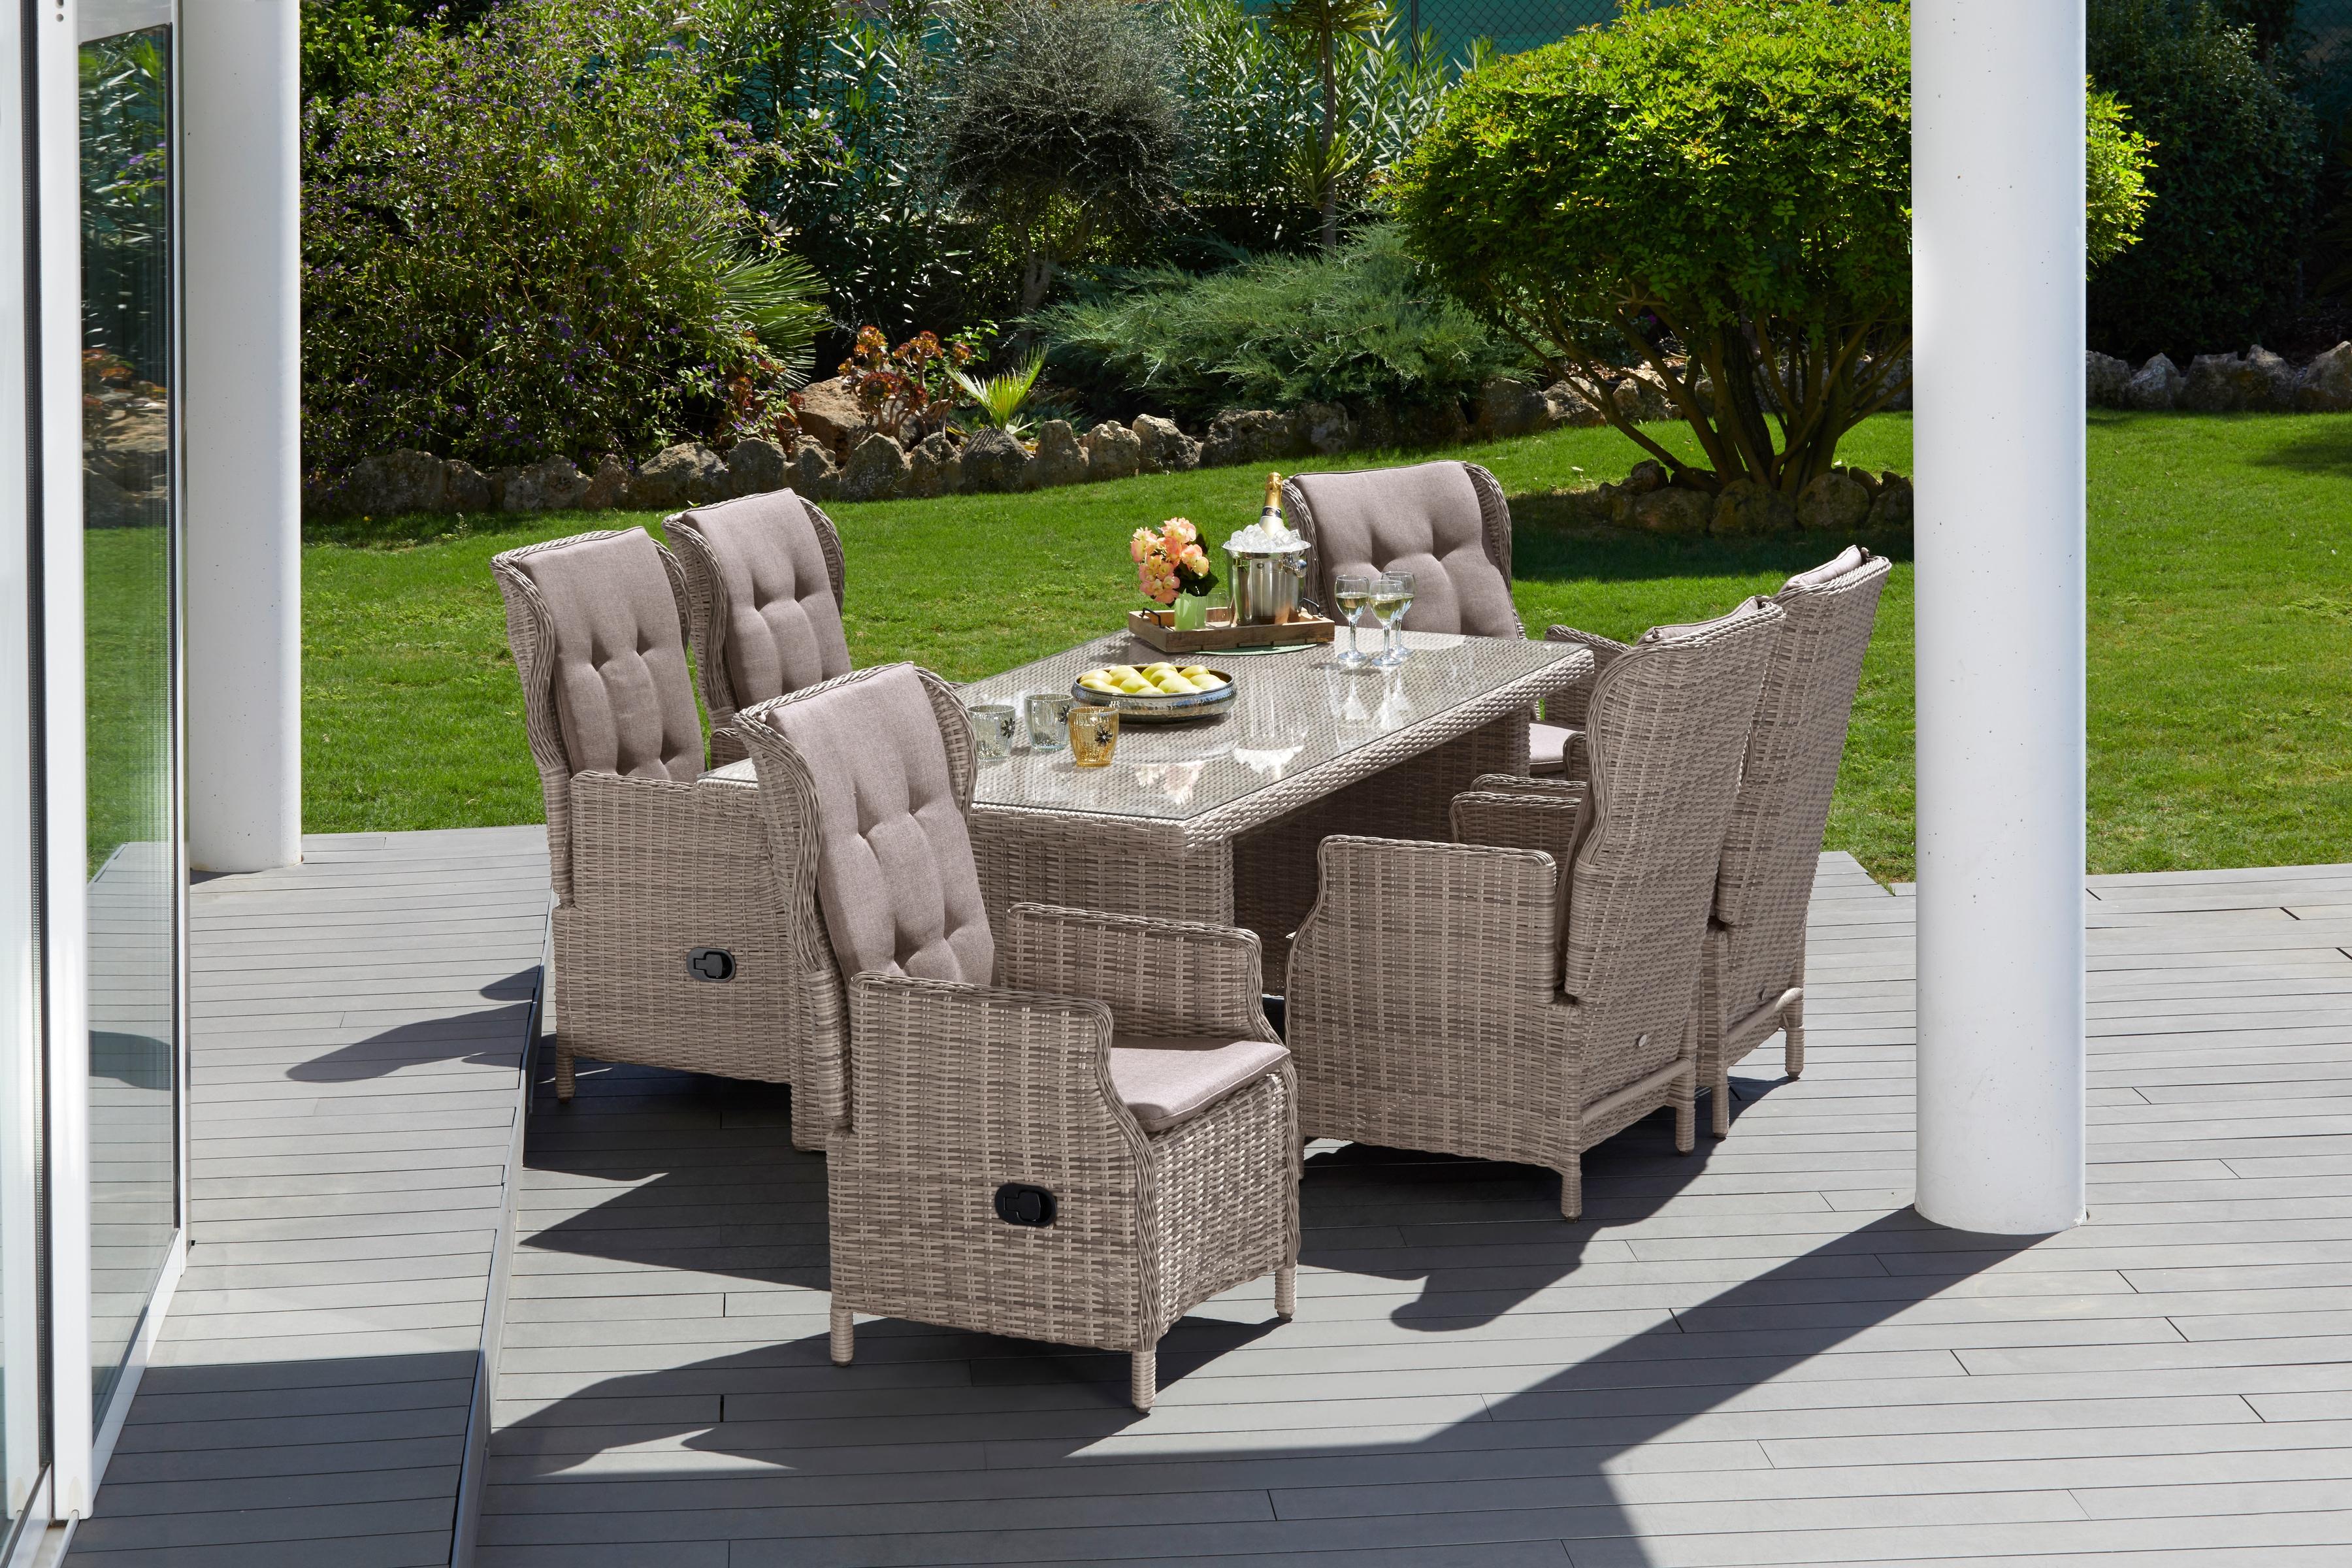 MERXX Gartenmöbelset Riviera 13-tlg 6 Sessel Tisch 200x100 cm Kunststoff/Stahl